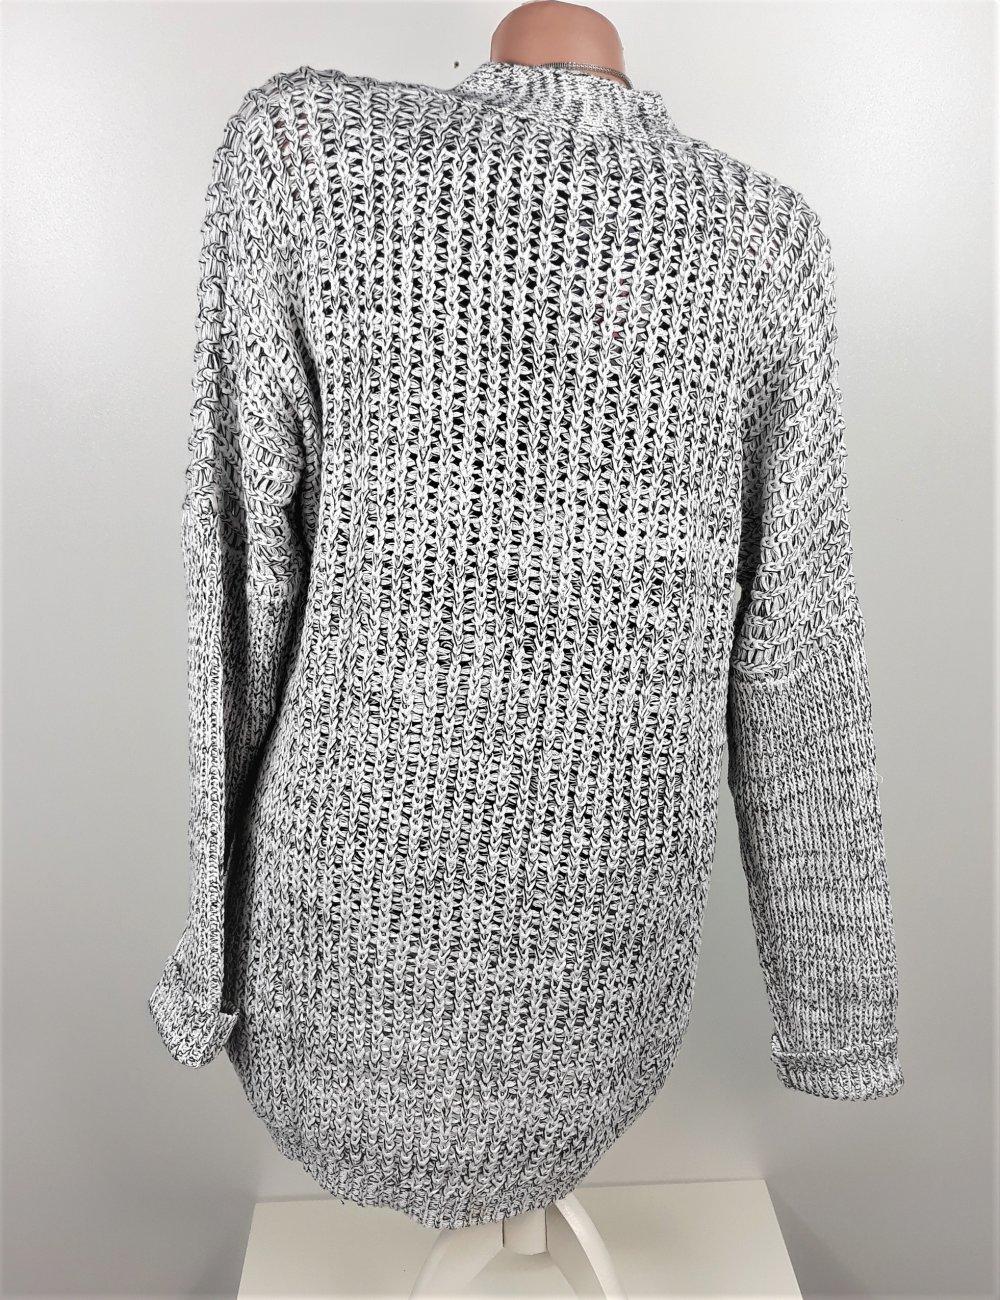 ac5ad35f474139 ... Strickjacke Cardigan Grobstrick Jacke Oversize grau meliert Größe 40 42  ...